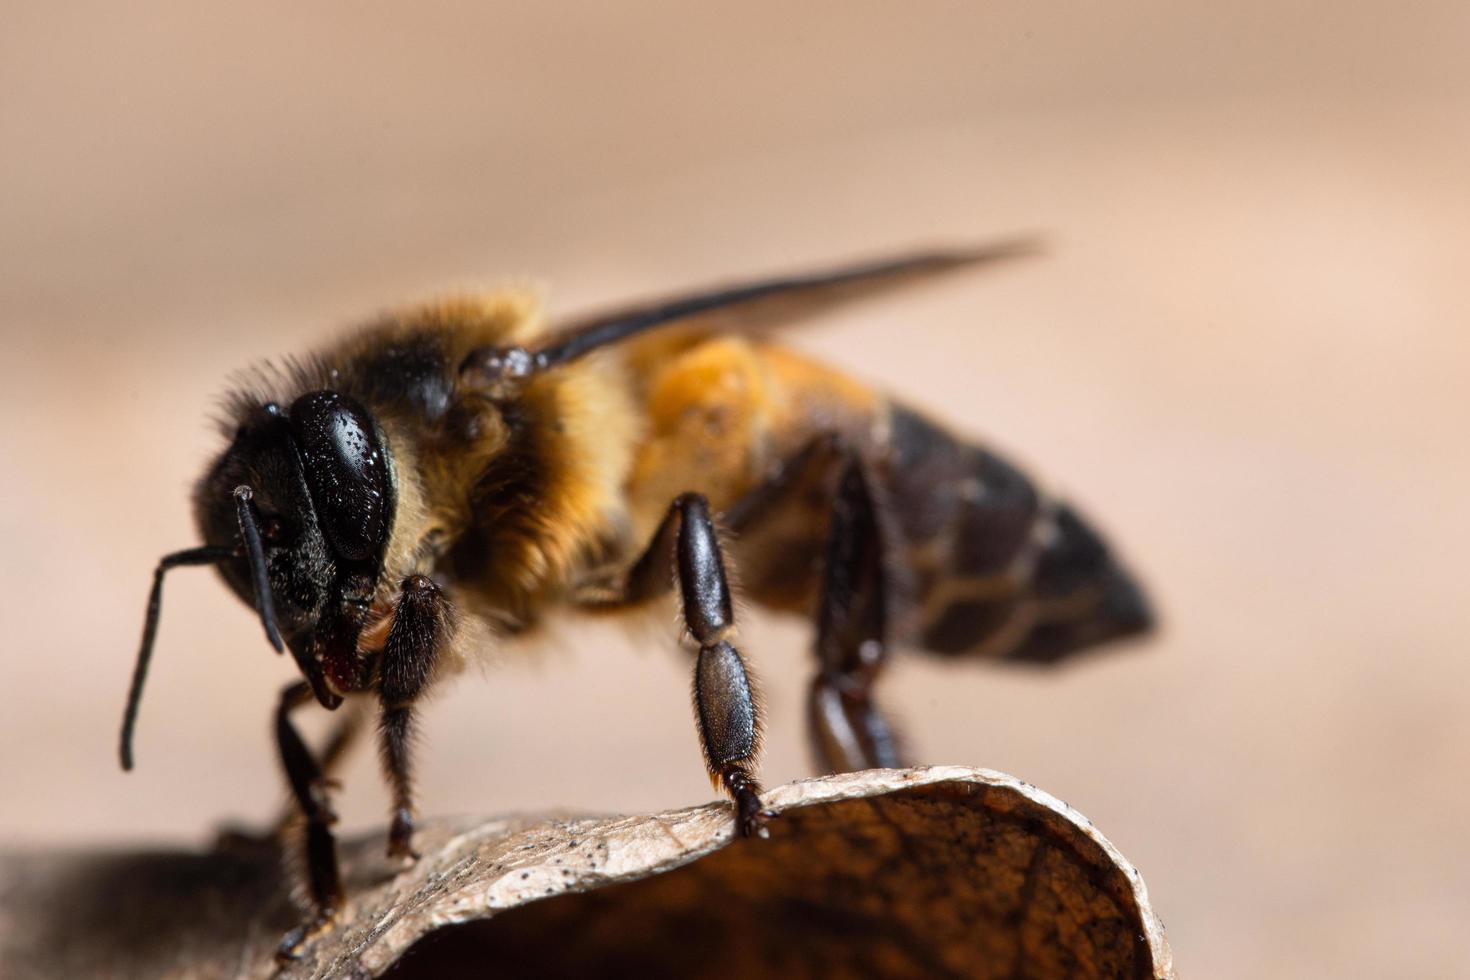 abeja en una hoja foto